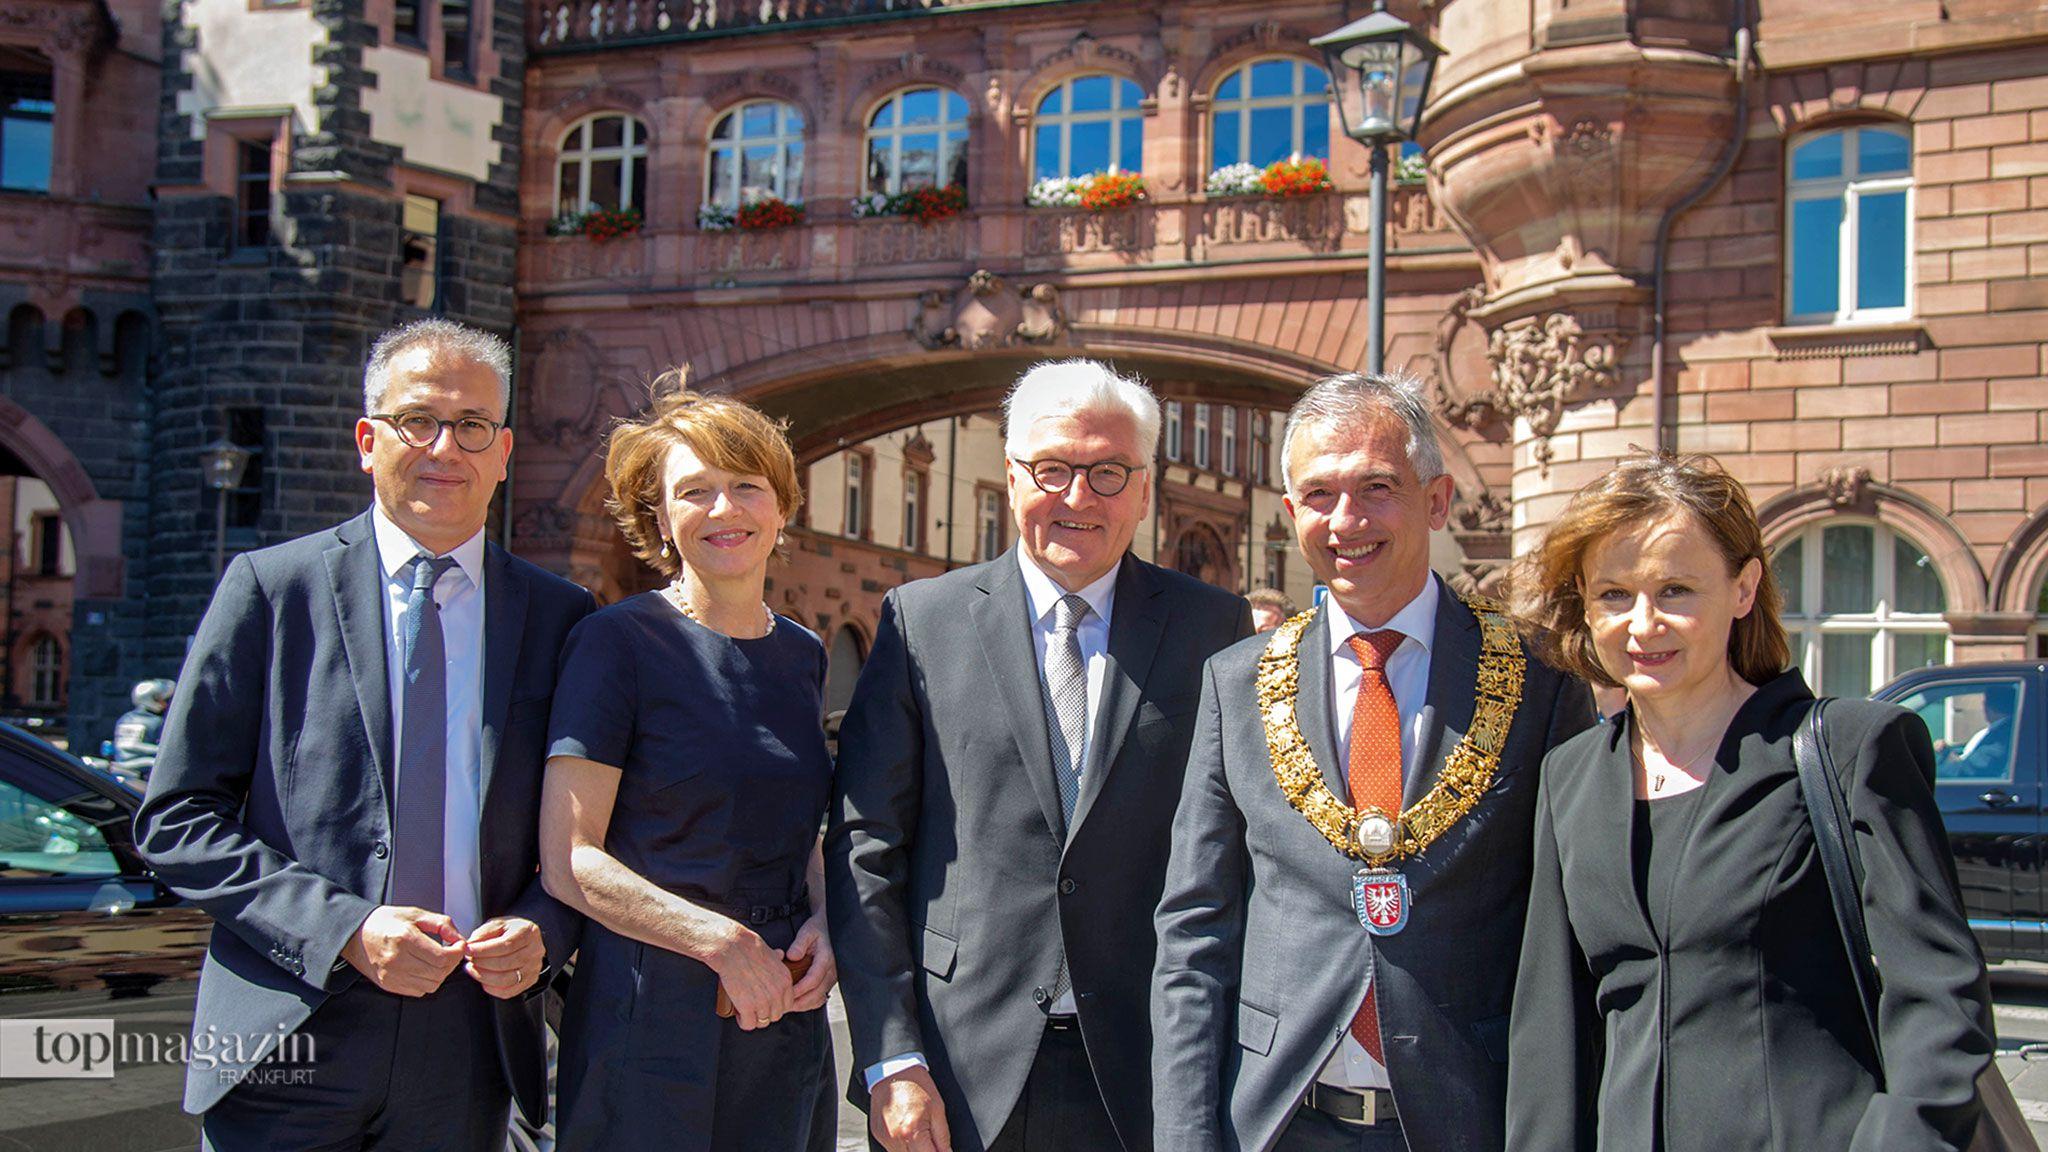 Staatsminister Tarek Al-Wazir, Elke Büdenbender, Bundespräsident Frank-Walter Steinmeier, Oberbürgermeister Peter Feldmann und Prof. Sybille Steinbacher